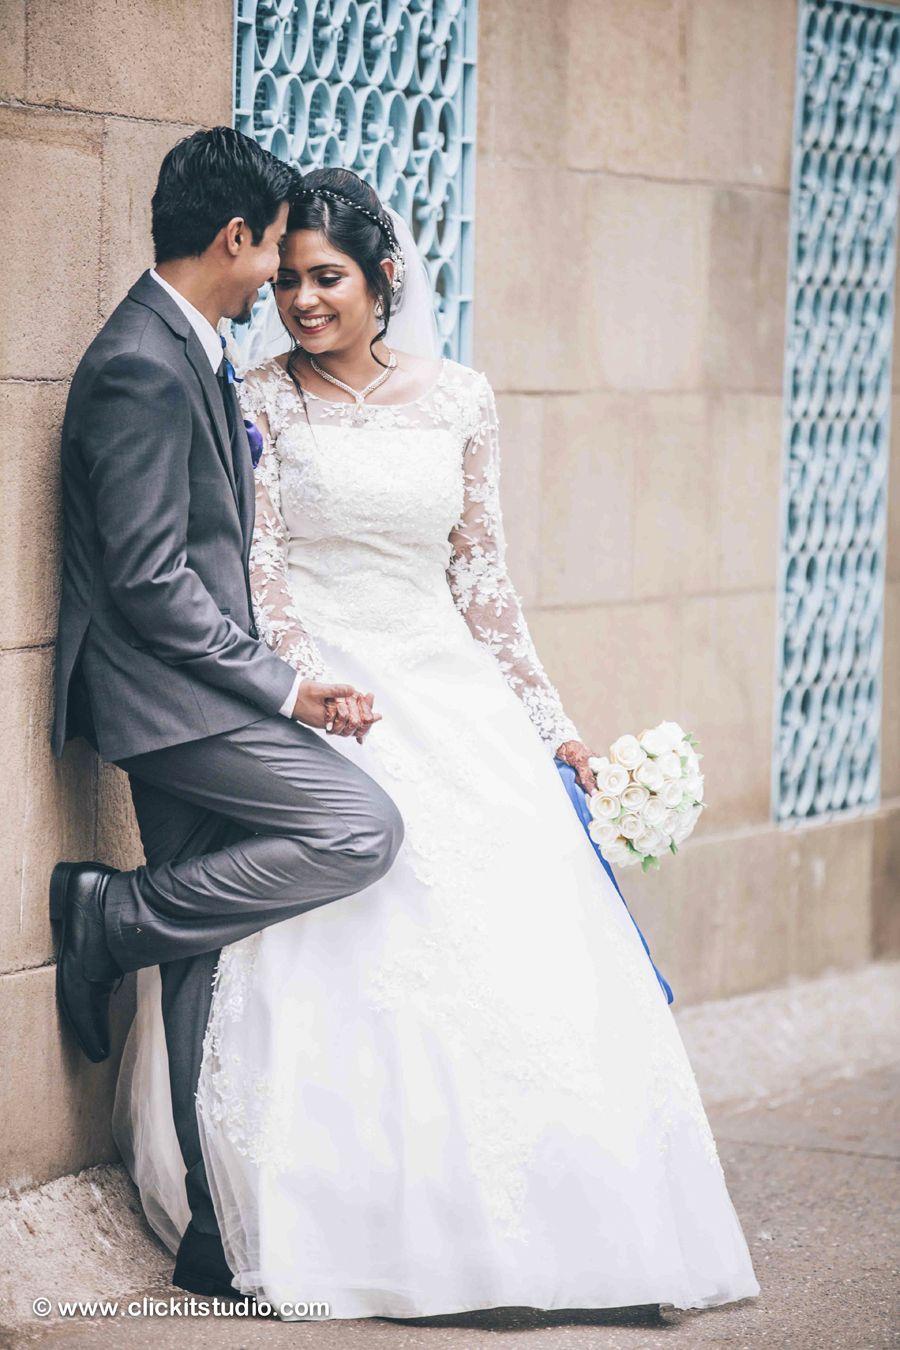 Pin by Clickit Studio on Catholic Weddings Mumbai Lace